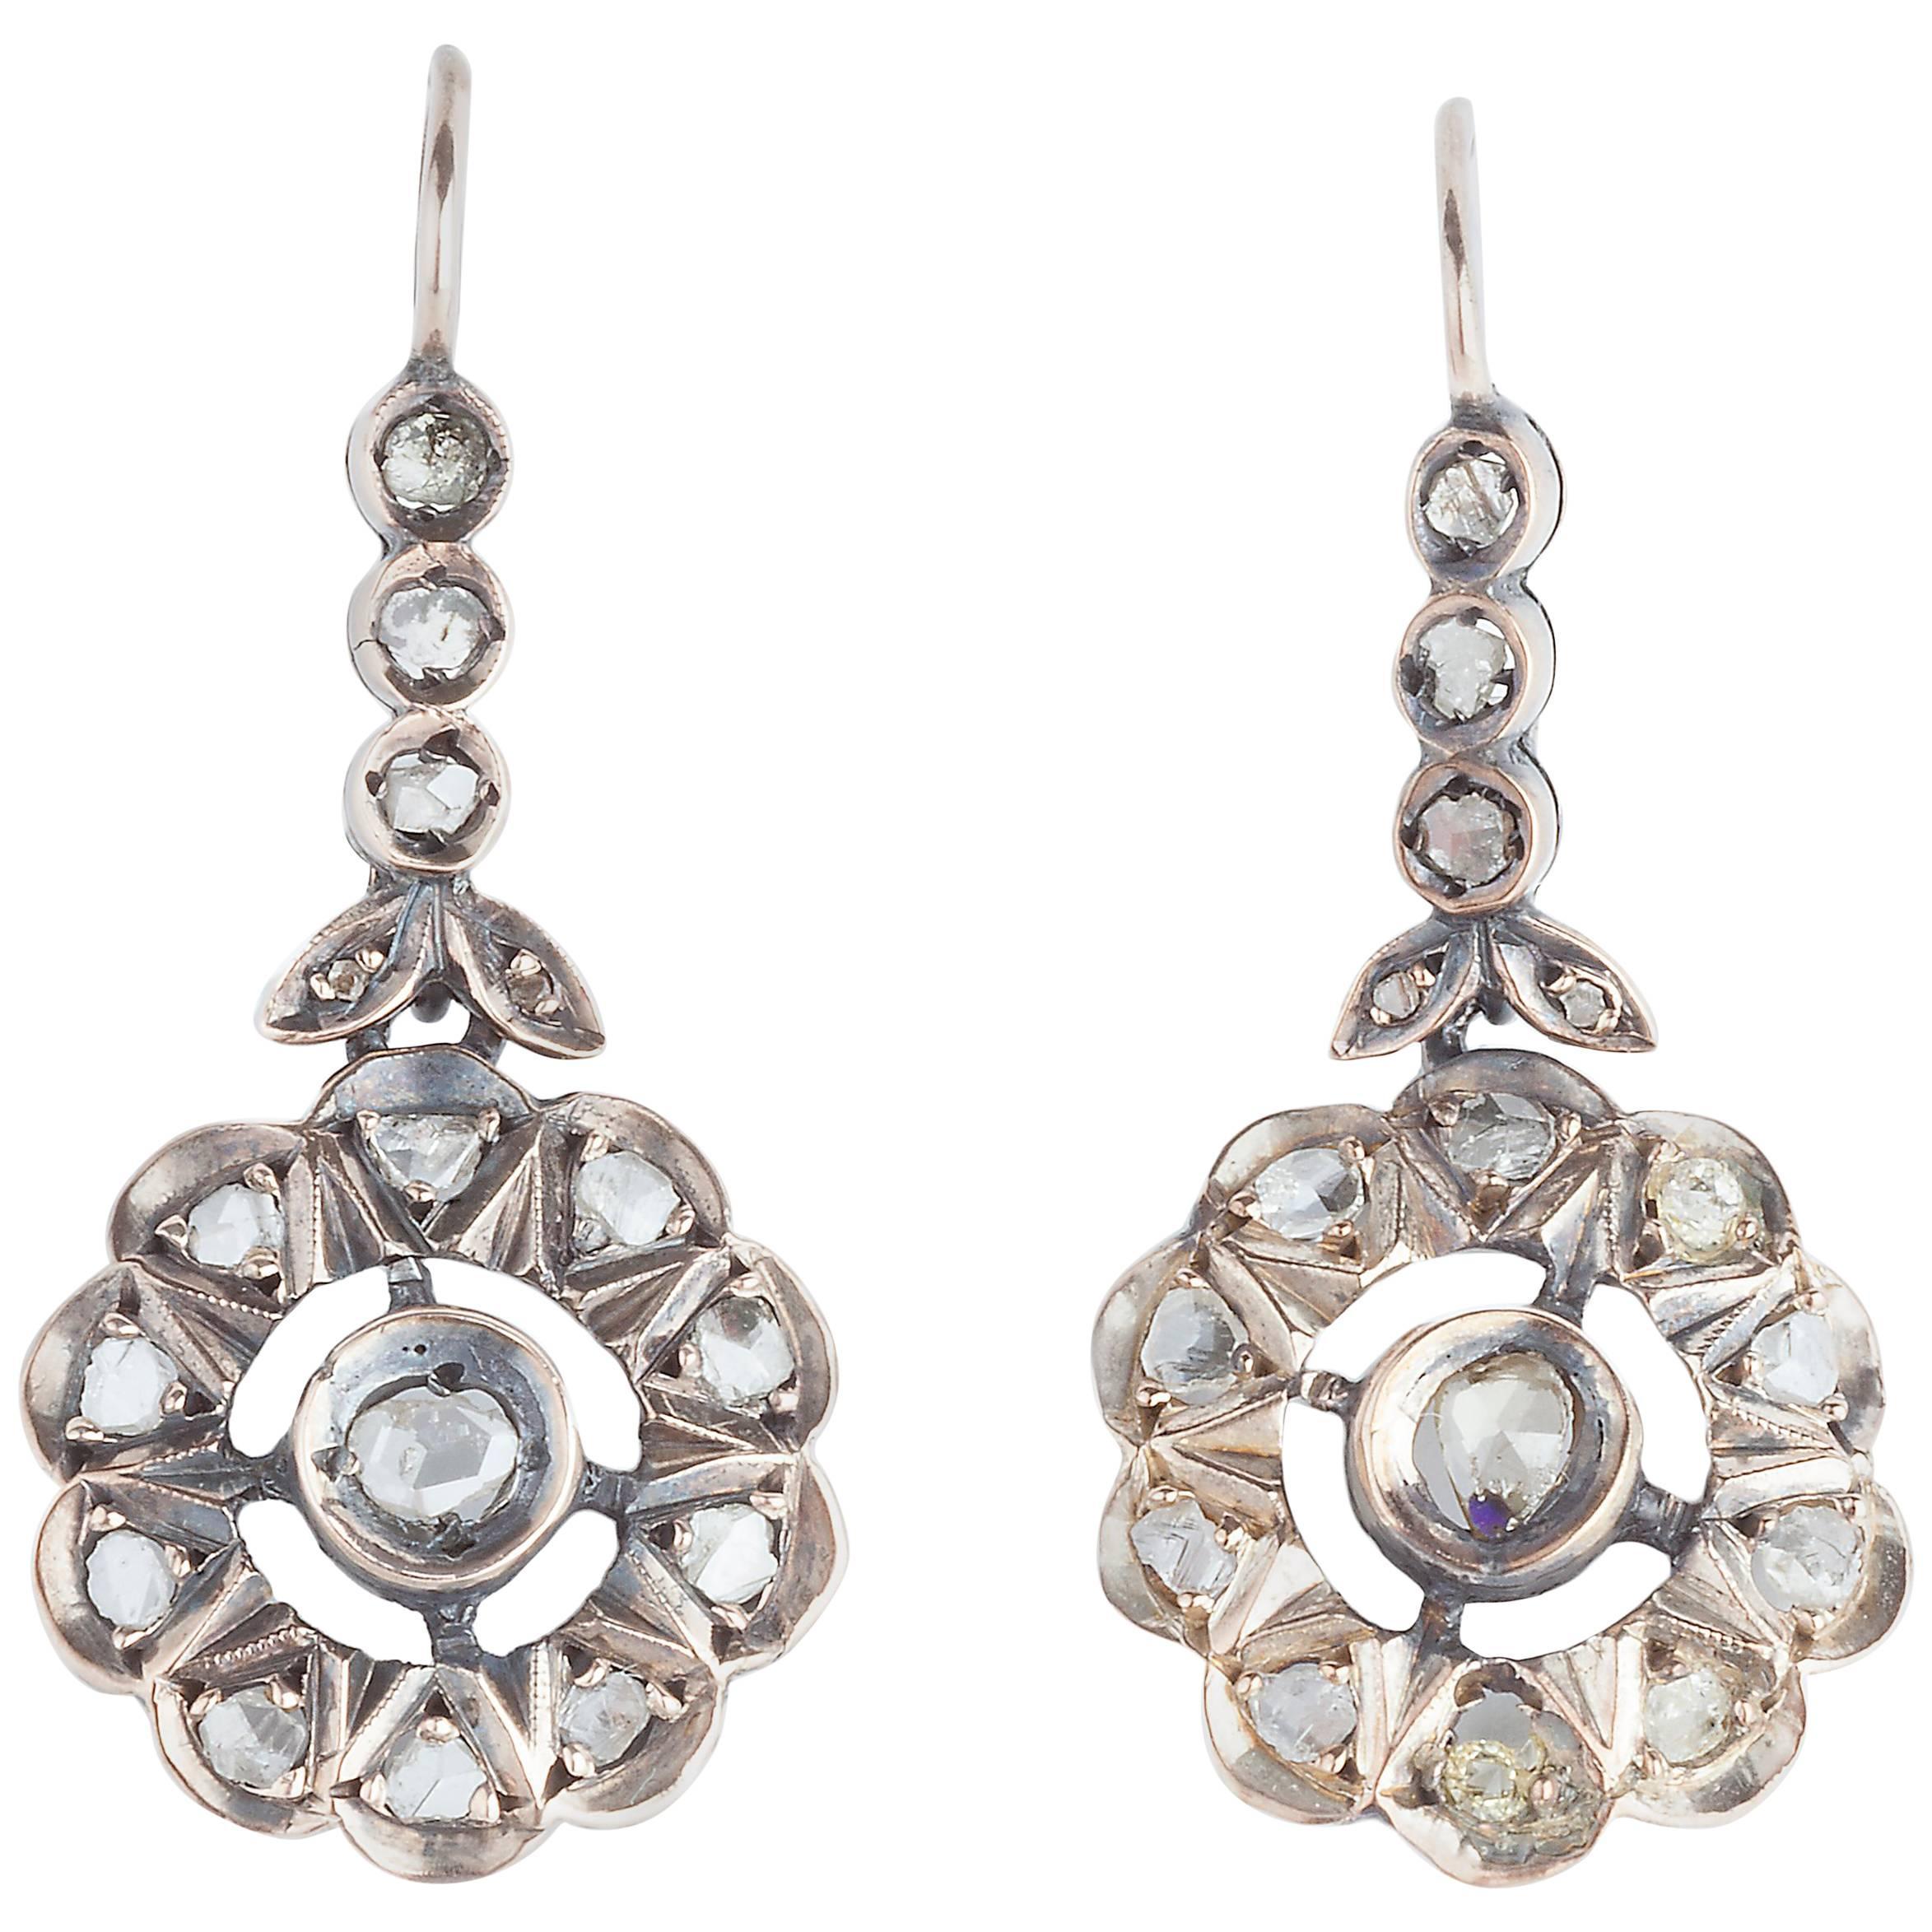 Edwardian Rose Cut Diamond Earrings For Sale at 1stdibs